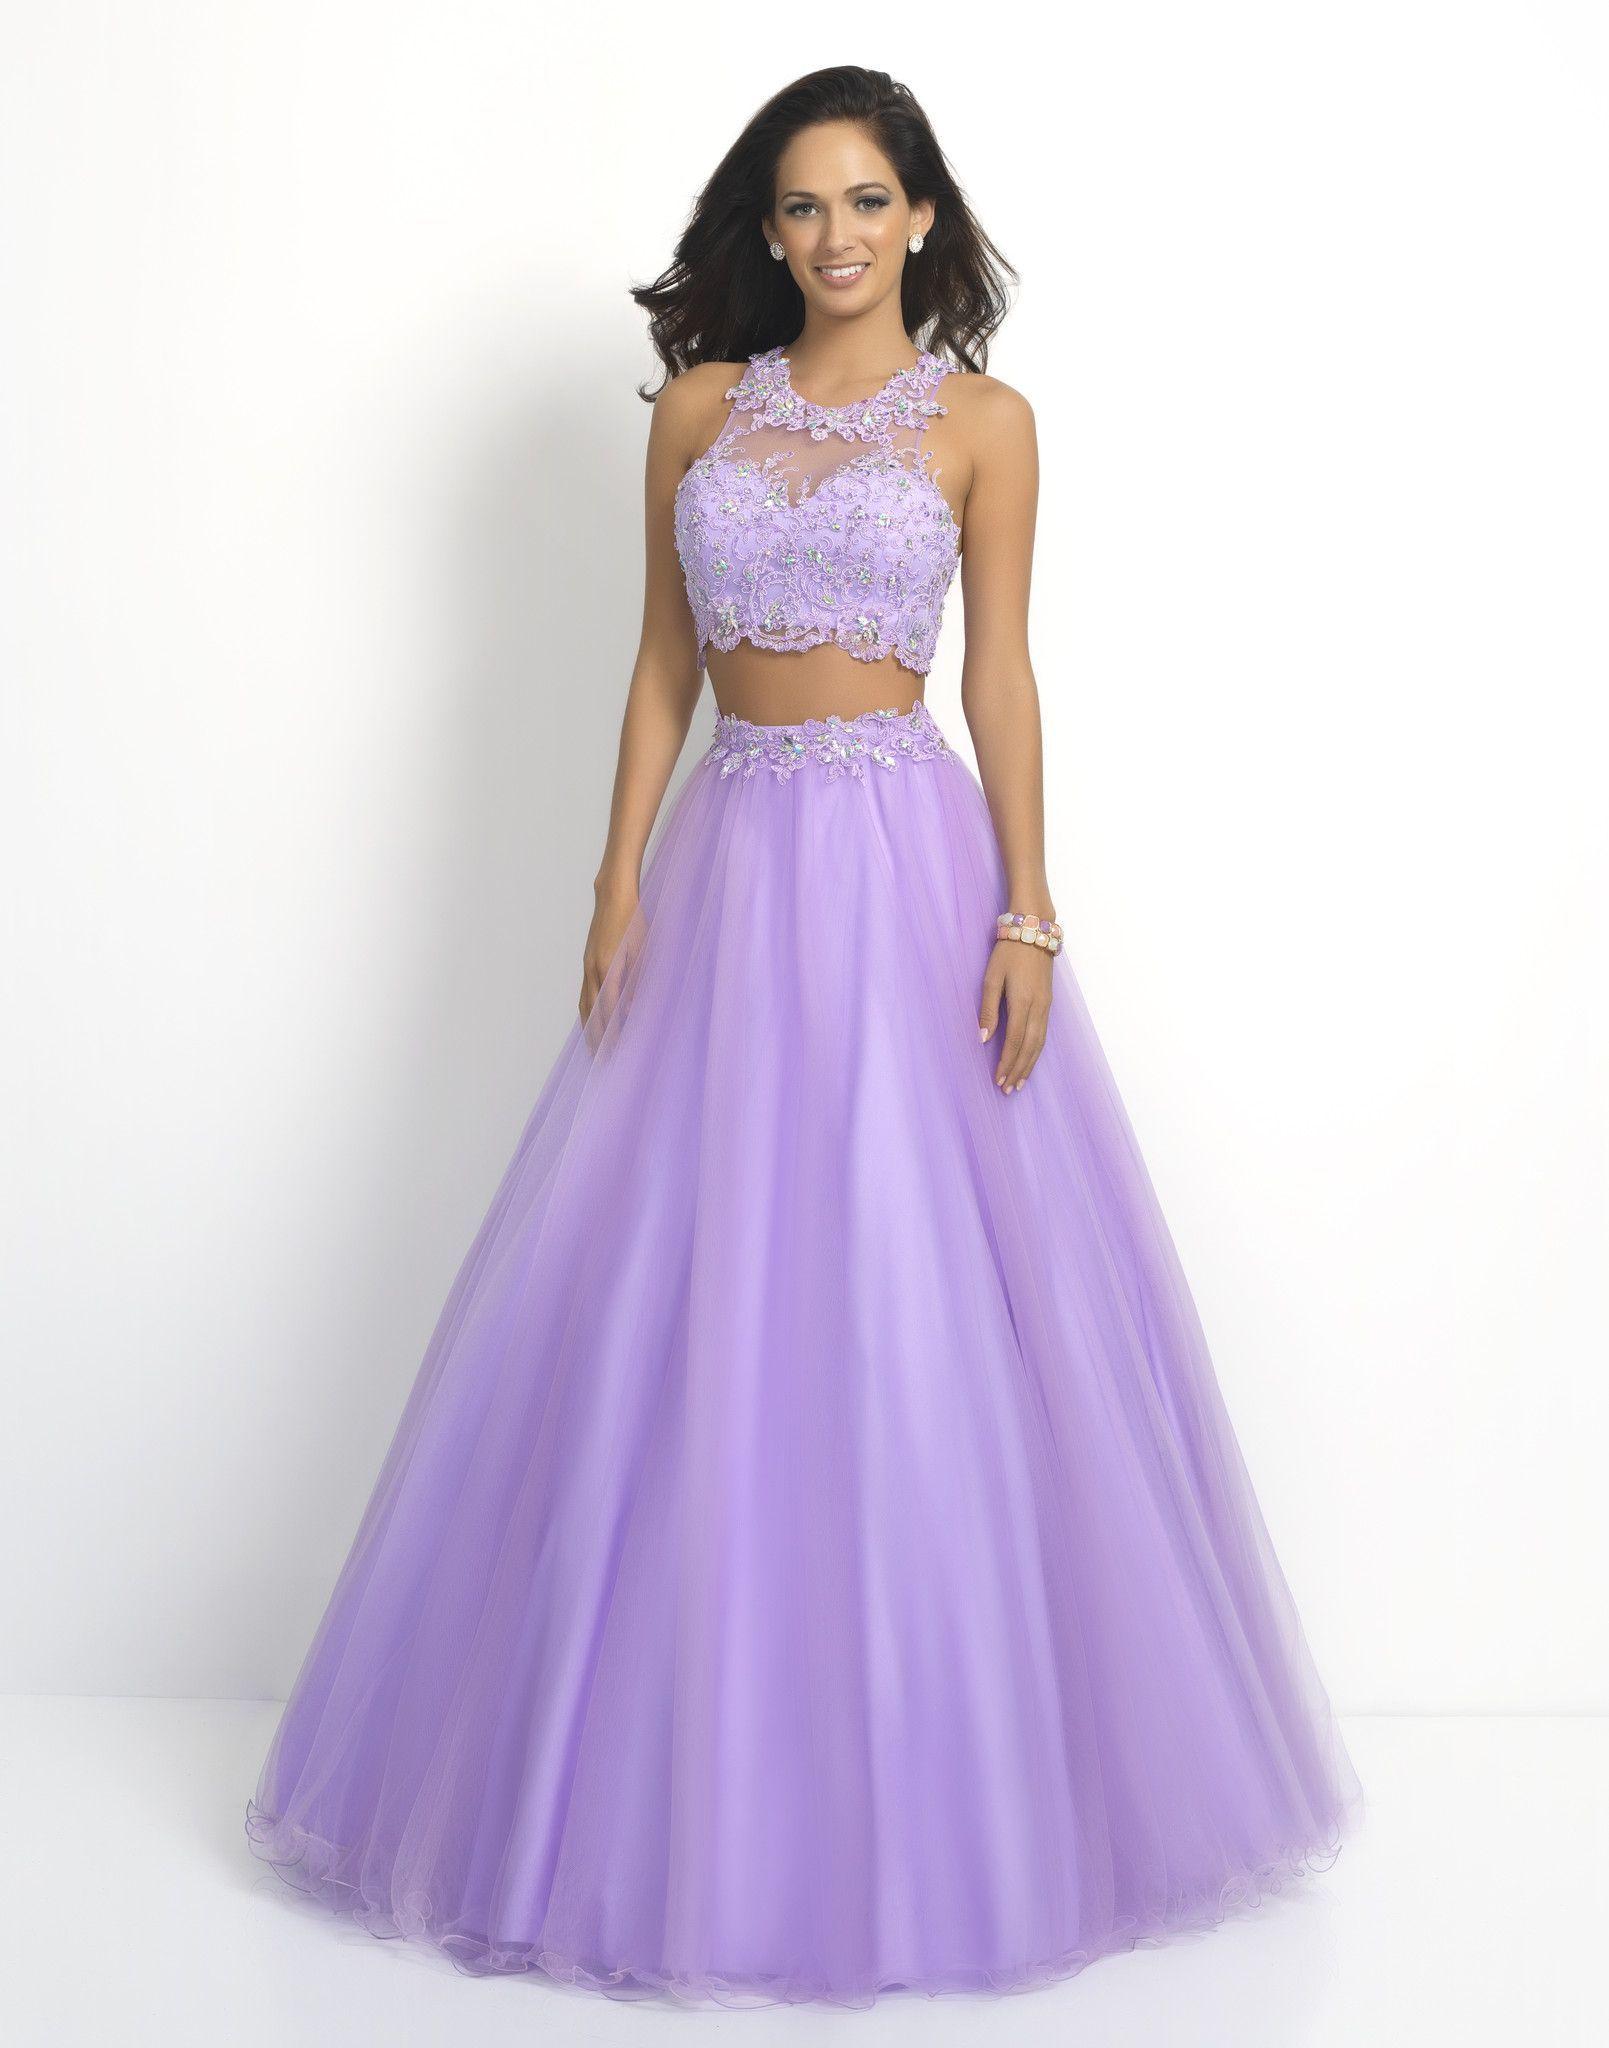 Lujo Light Pink Lace Prom Dress Foto - Vestido de Novia Para Las ...